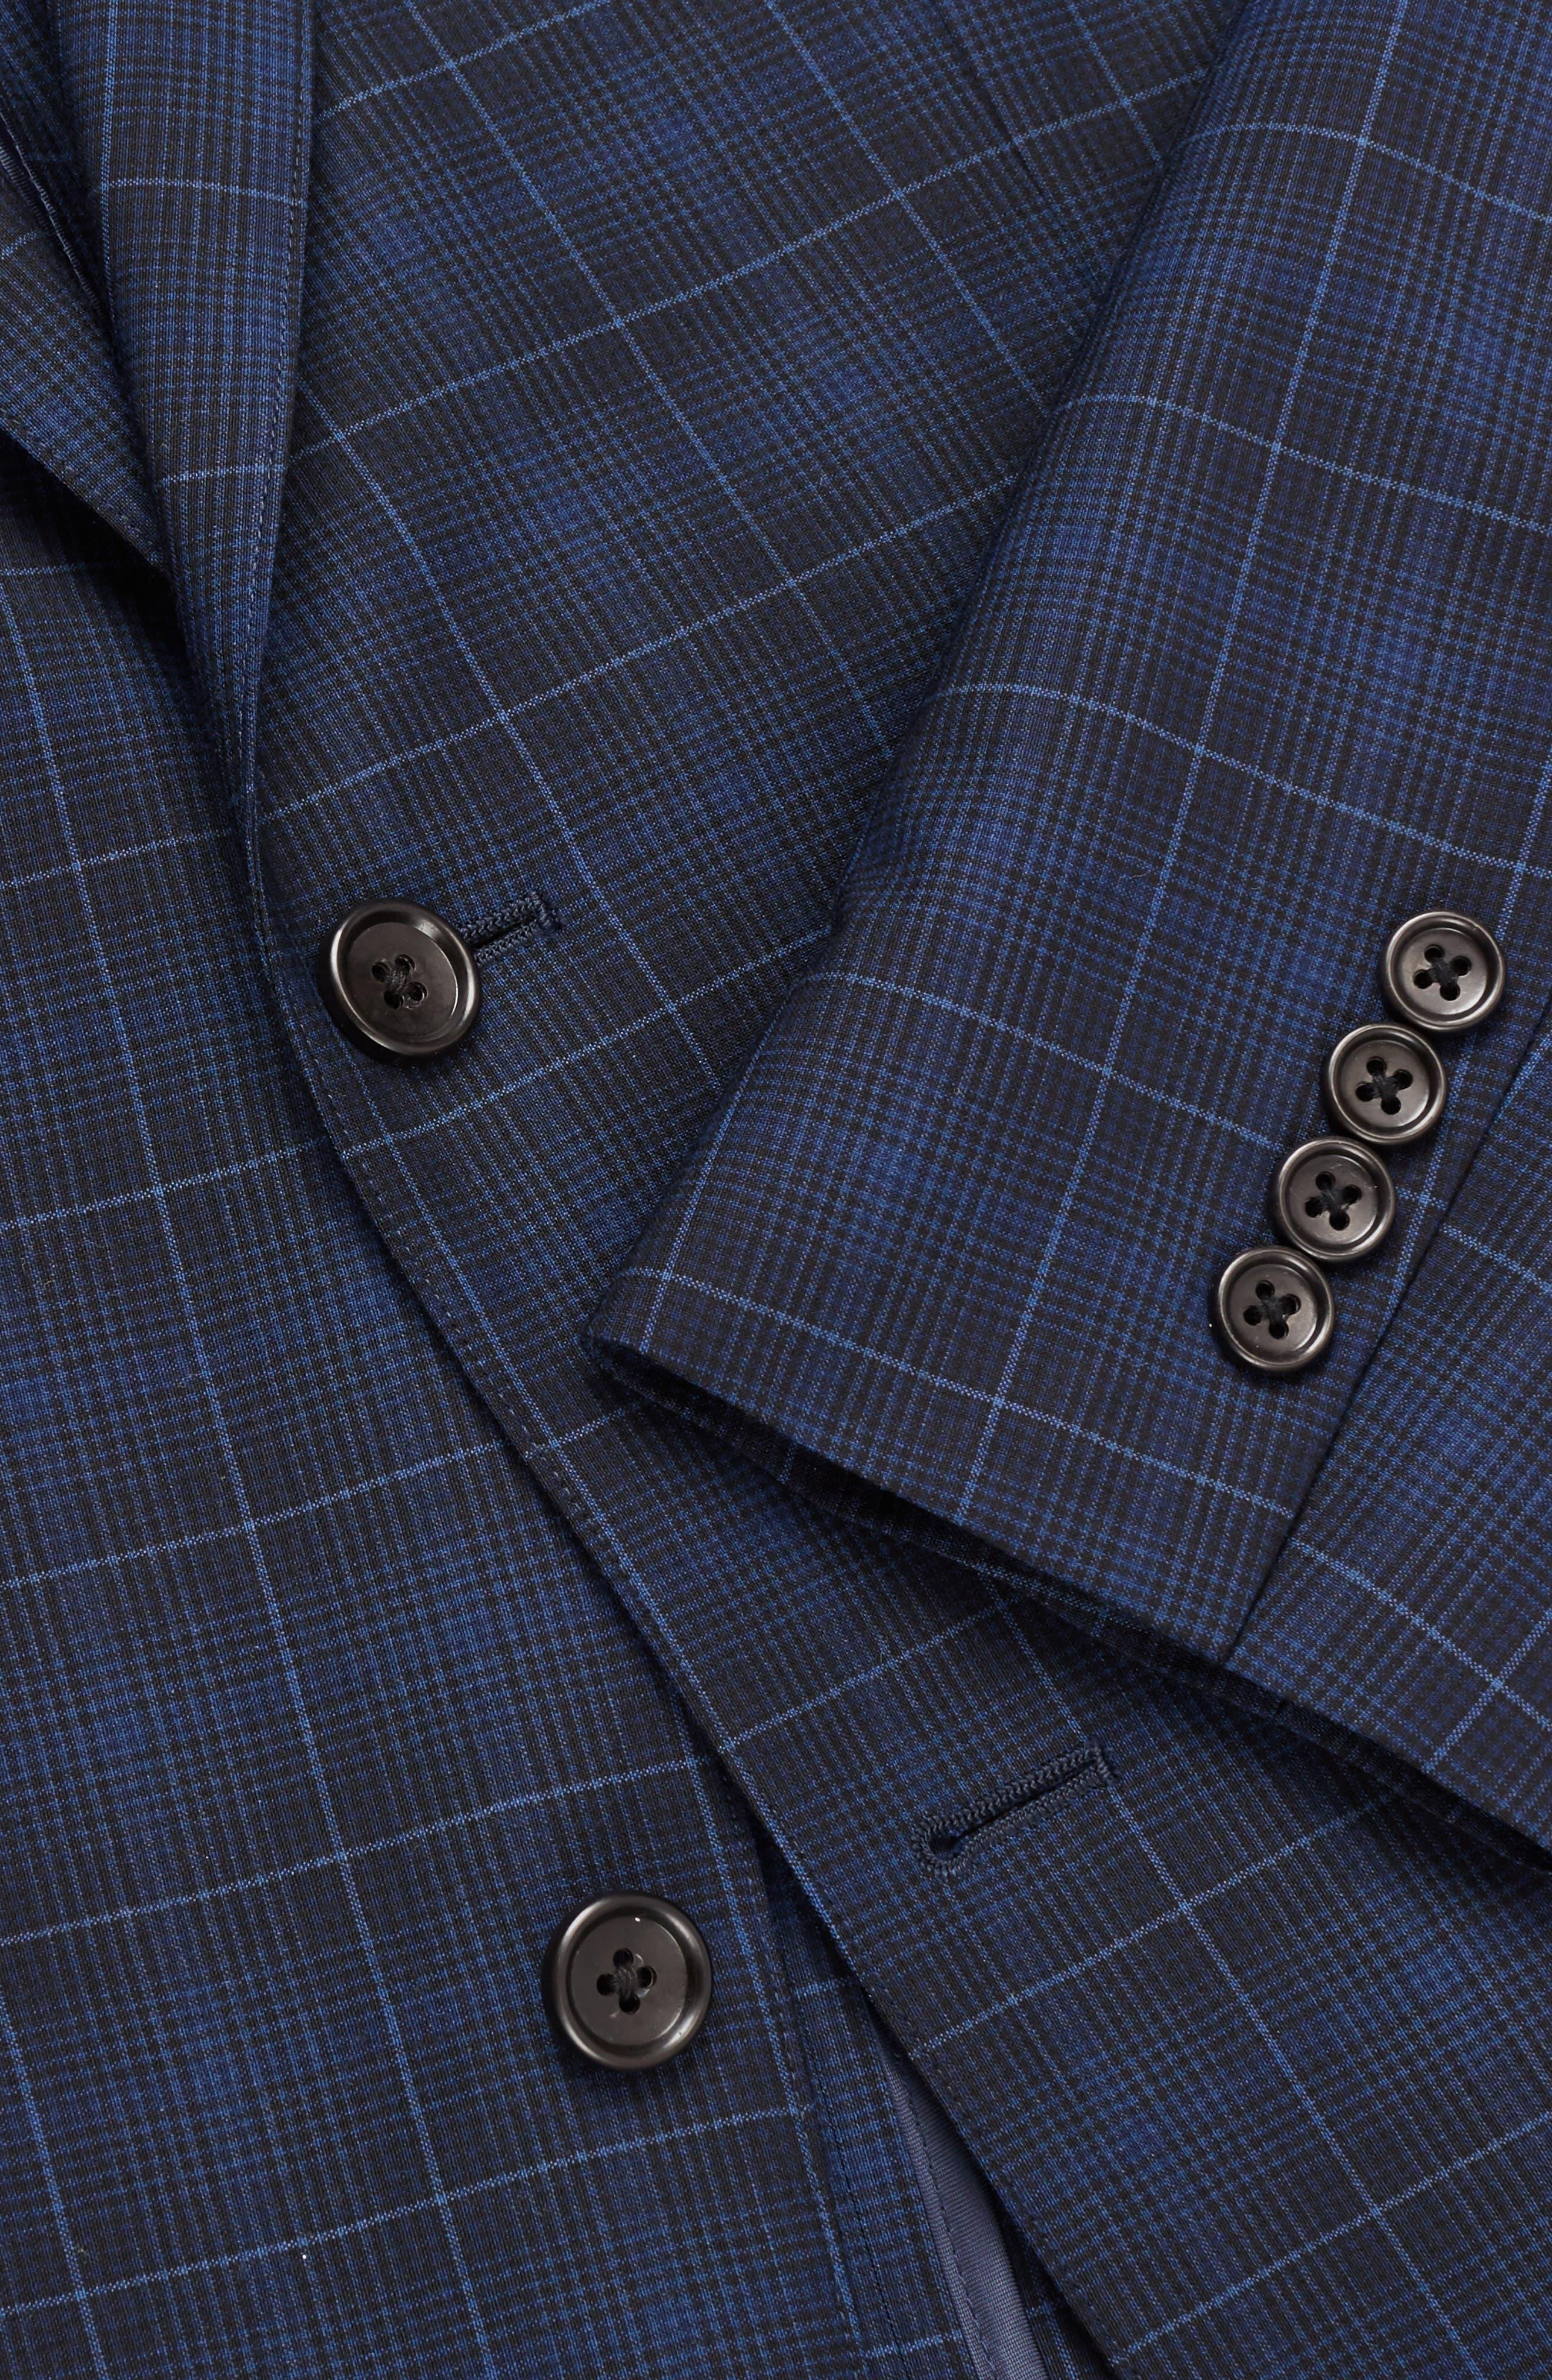 Jetsetter Slim Fit Plaid Wool Sport Coat,                             Alternate thumbnail 3, color,                             400